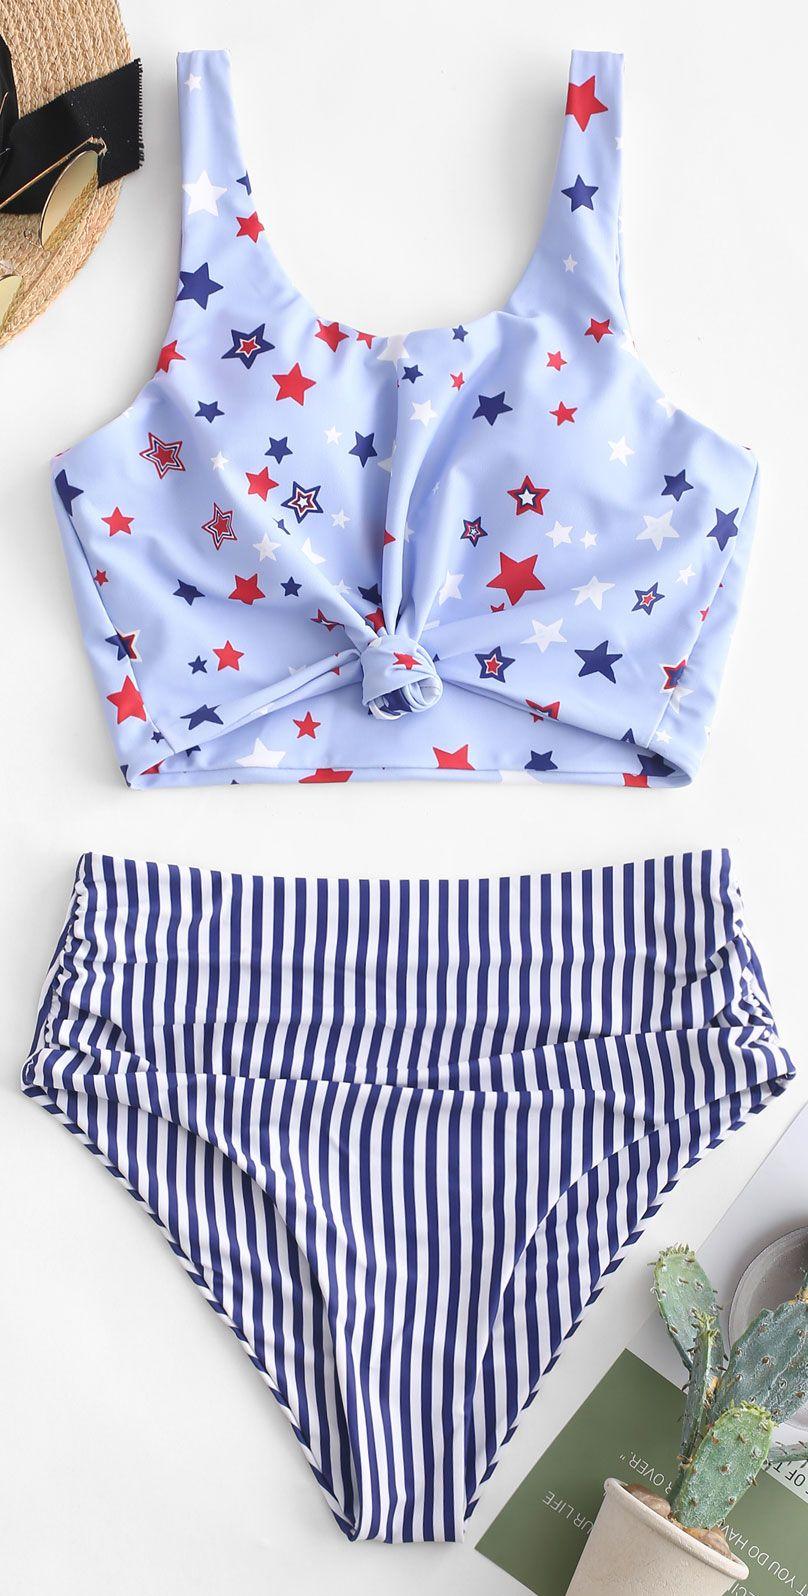 Style Fashion Swimwear Type Tankini Gender For Women